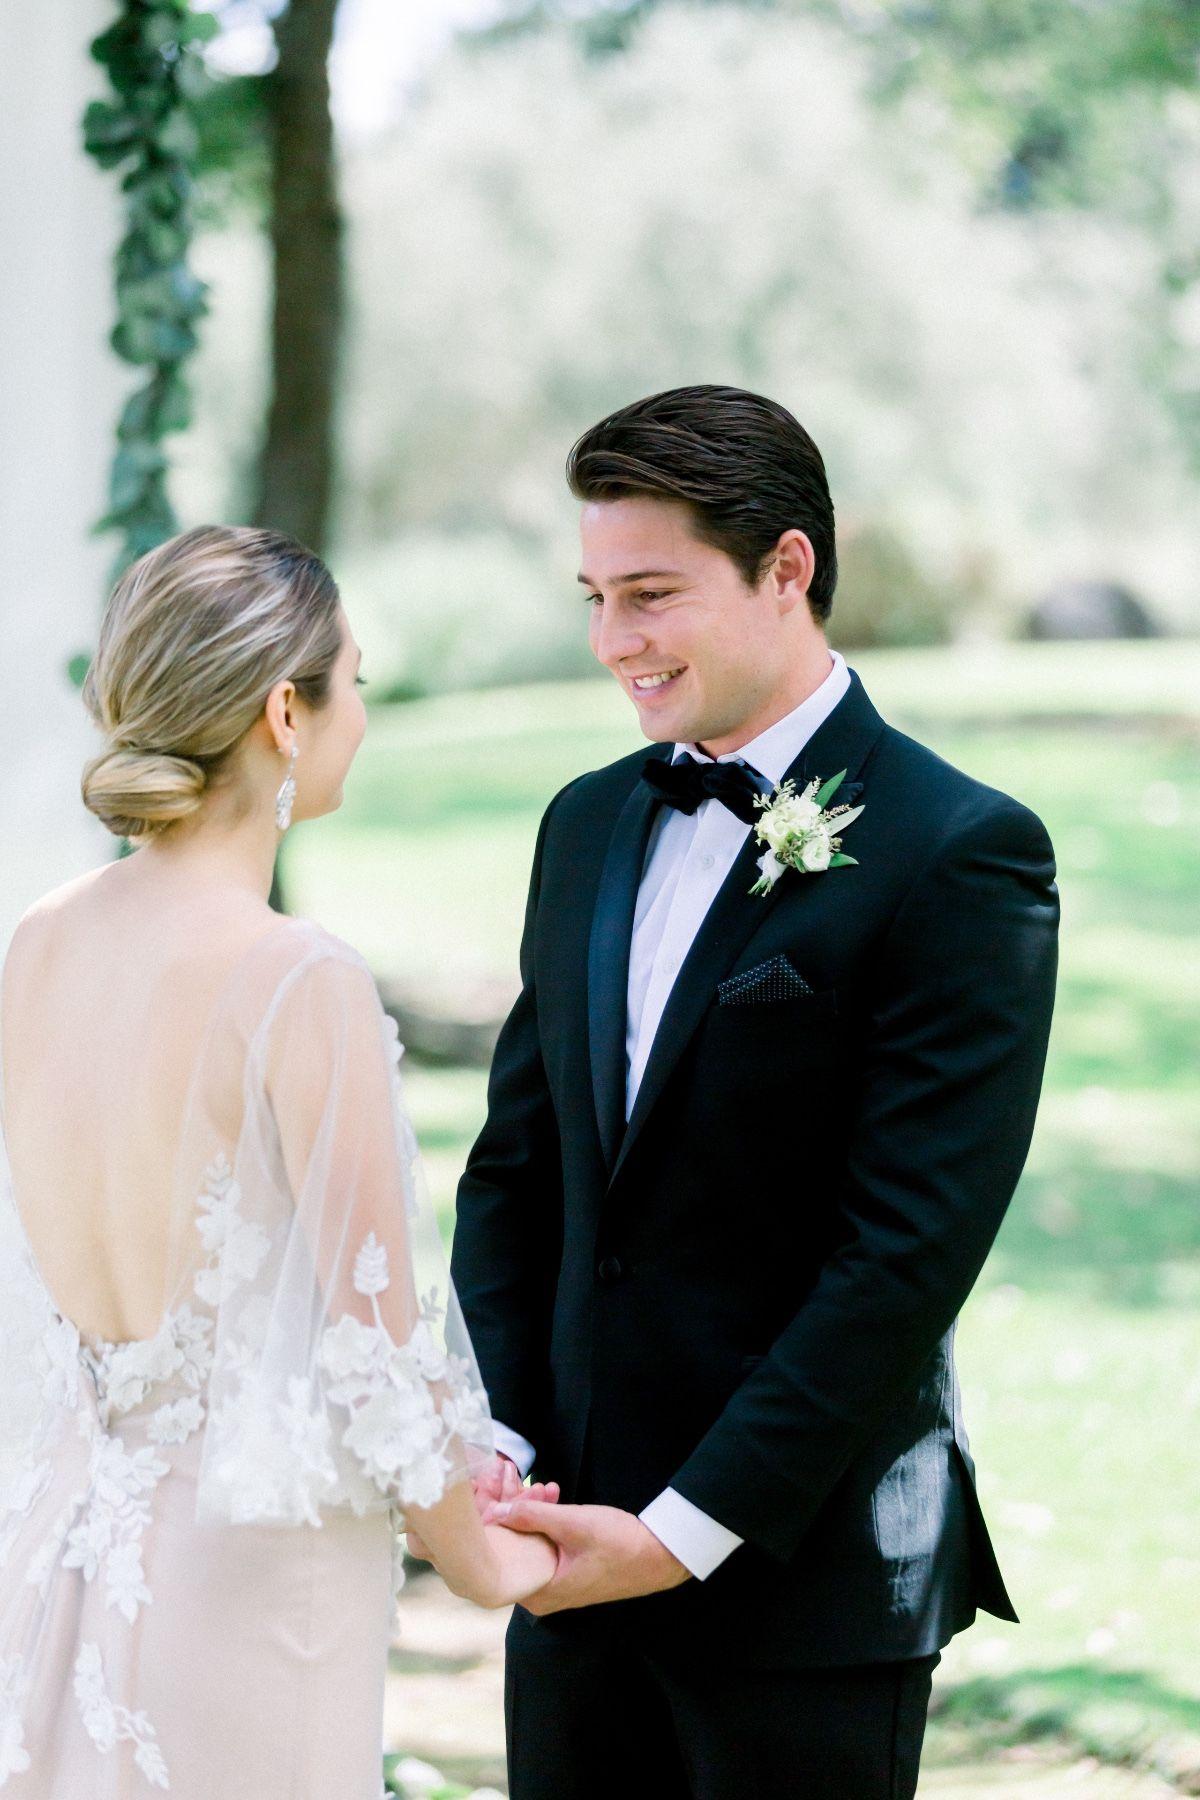 Tips For Planning Your Tiny Wedding In 2020 Tiny Wedding Wedding Bridal Inspiration